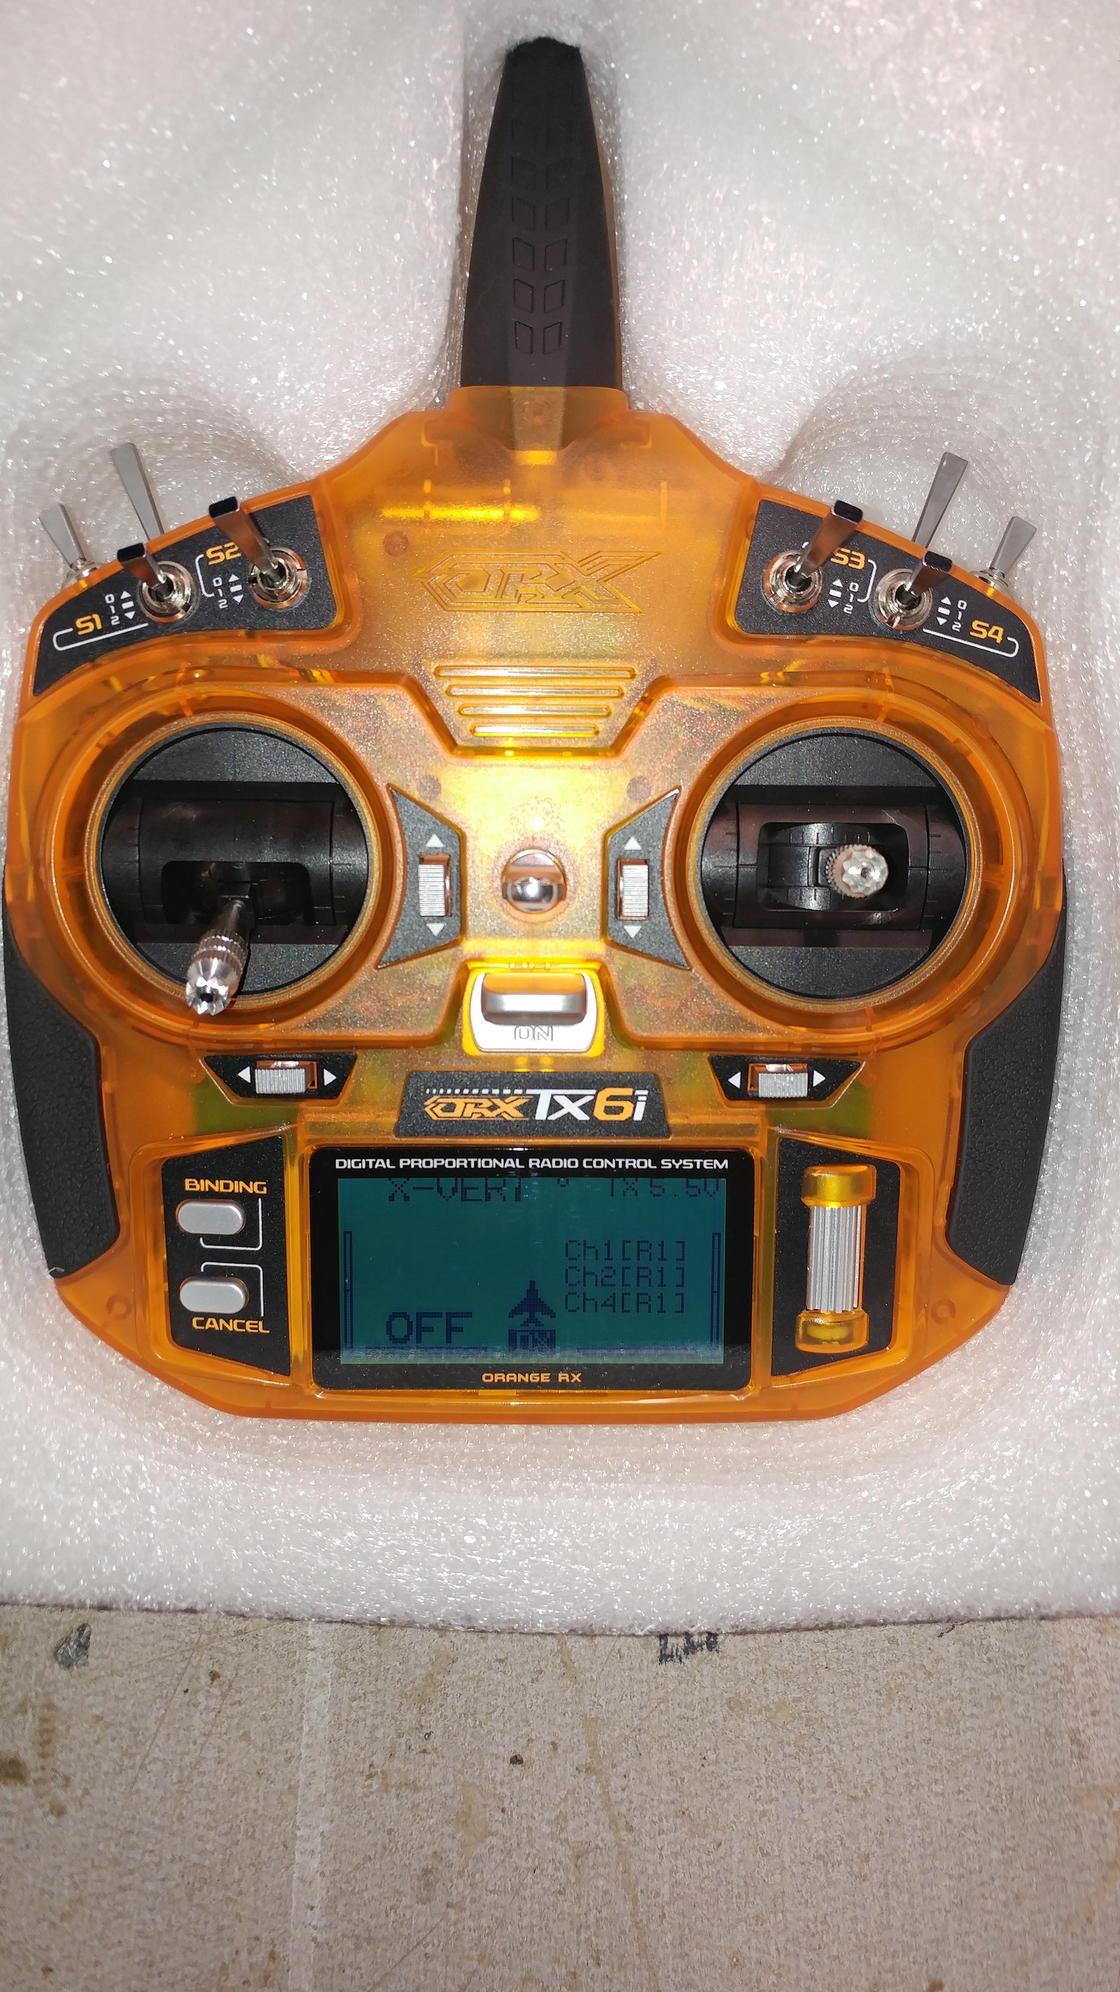 Orange Tx6i Full Range 2 4GHz DSM2/DSMX compatible 6ch Radio System